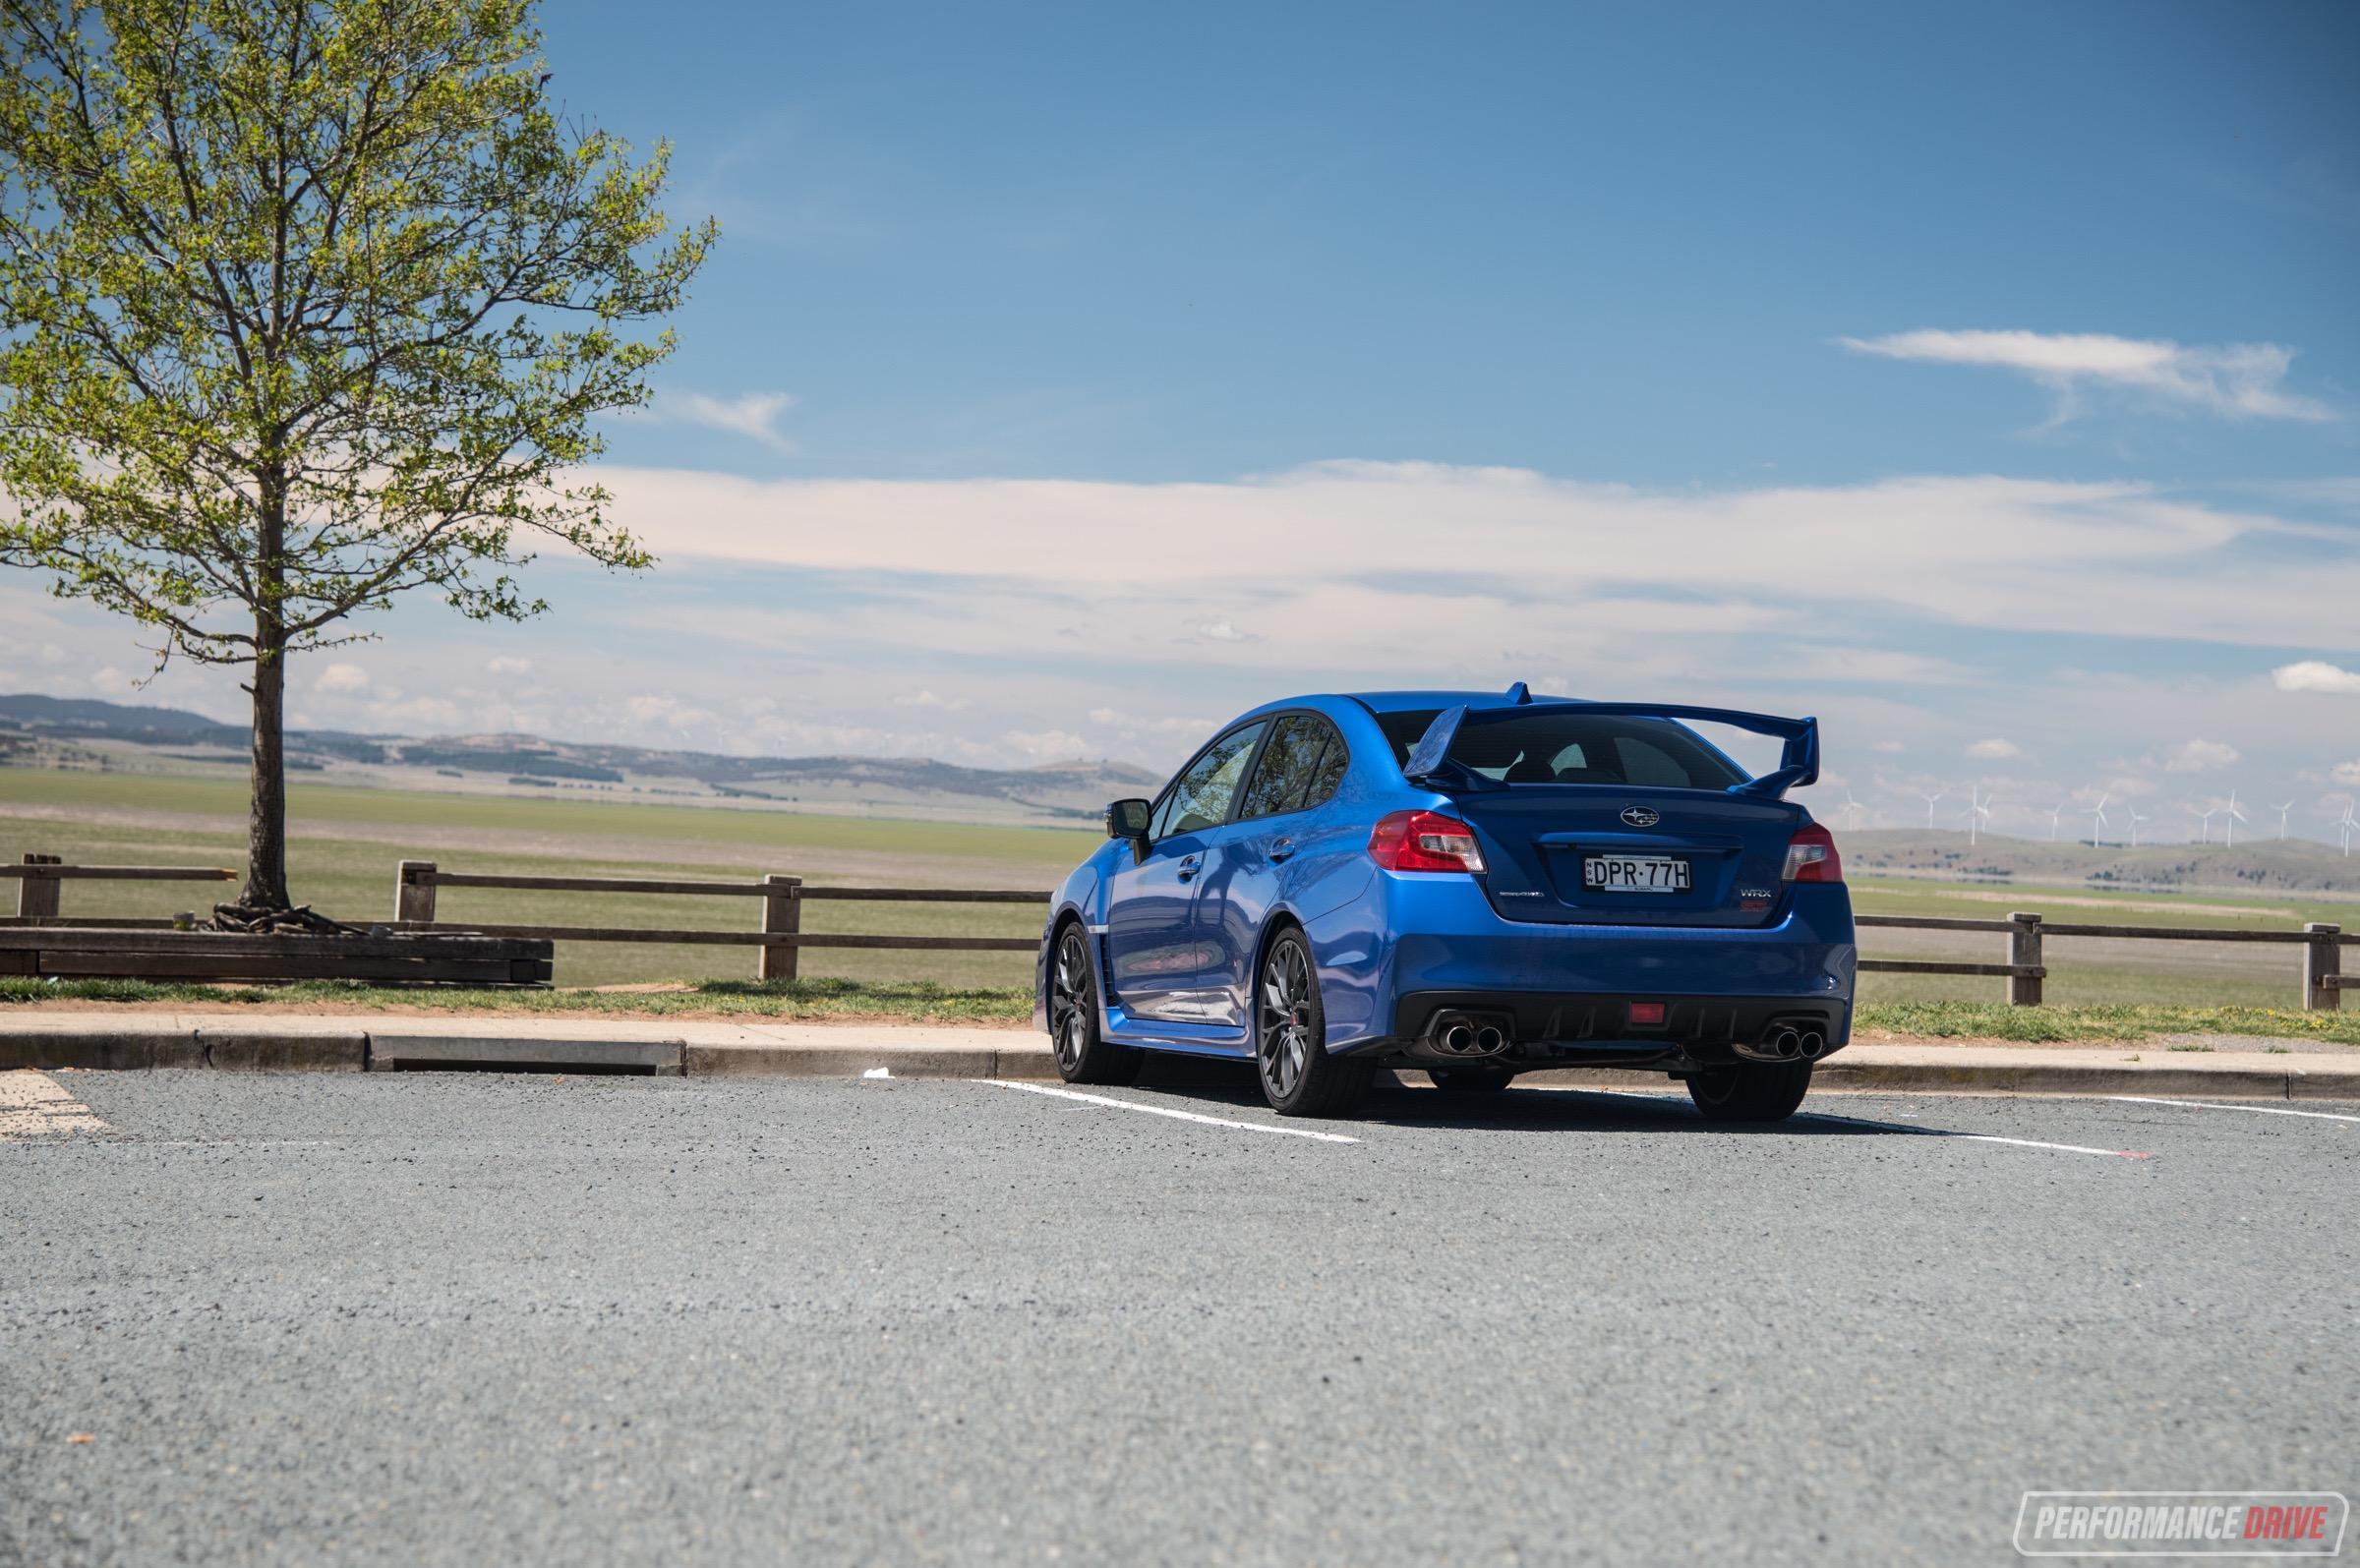 2018 Subaru WRX STI review – spec R & Premium (video) | PerformanceDrive